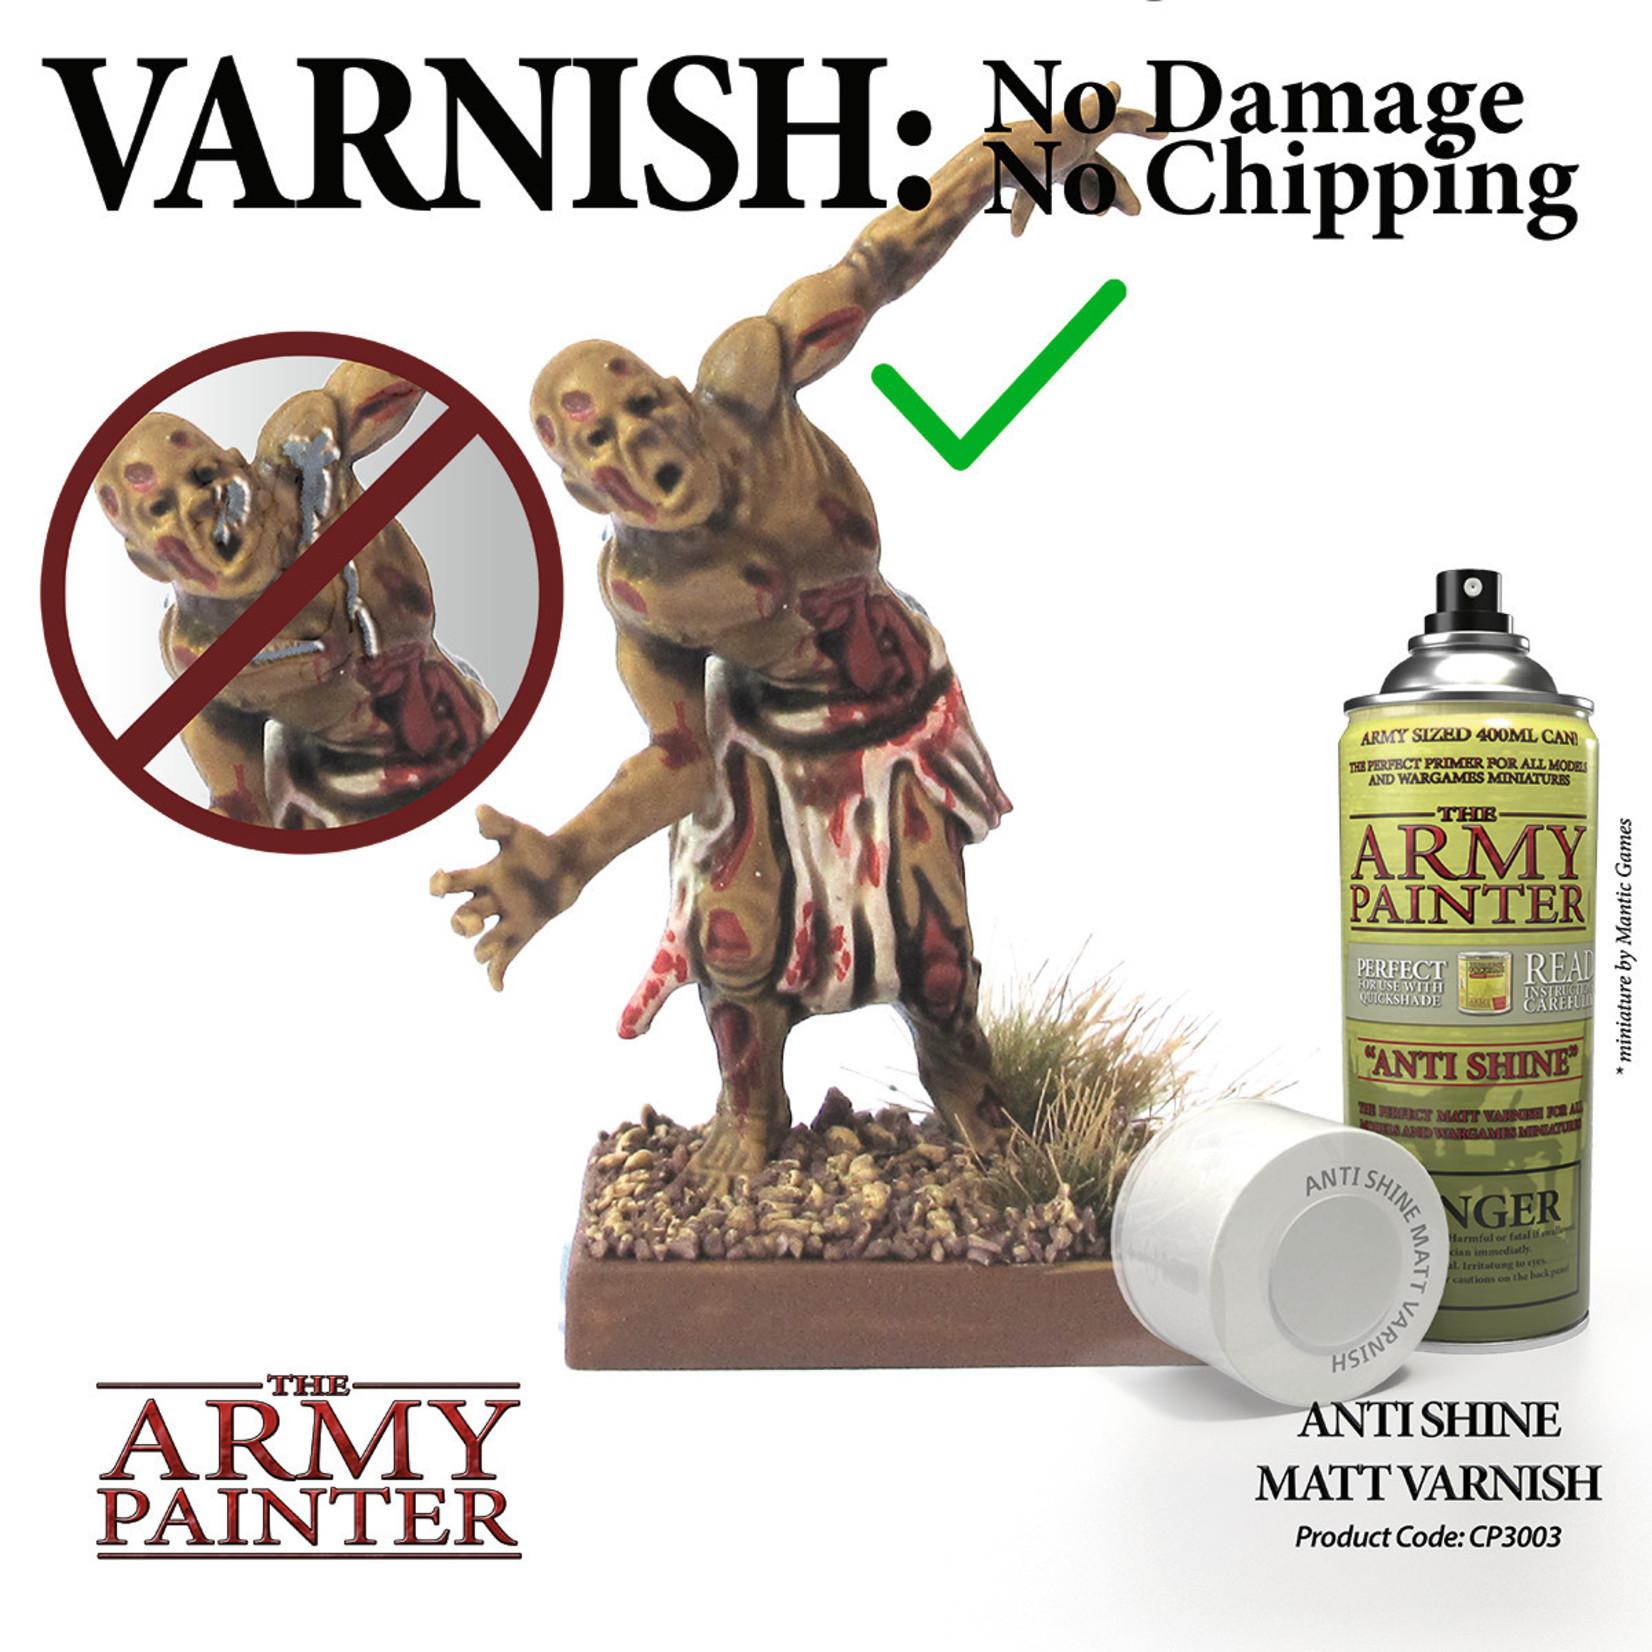 The Army Painter Anti Shine Matte Varnish